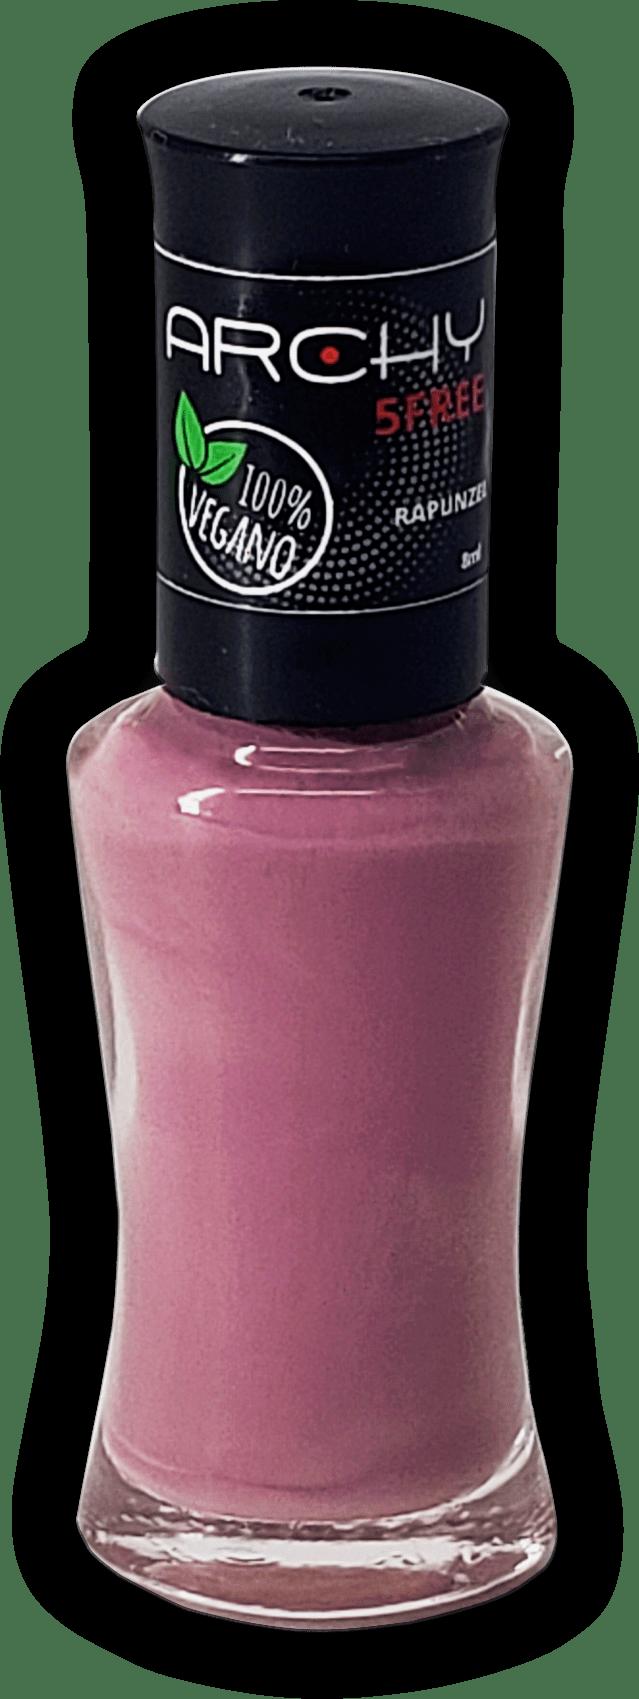 Esmalte Vegano 5 Free Rapunzel - Archy Make Up